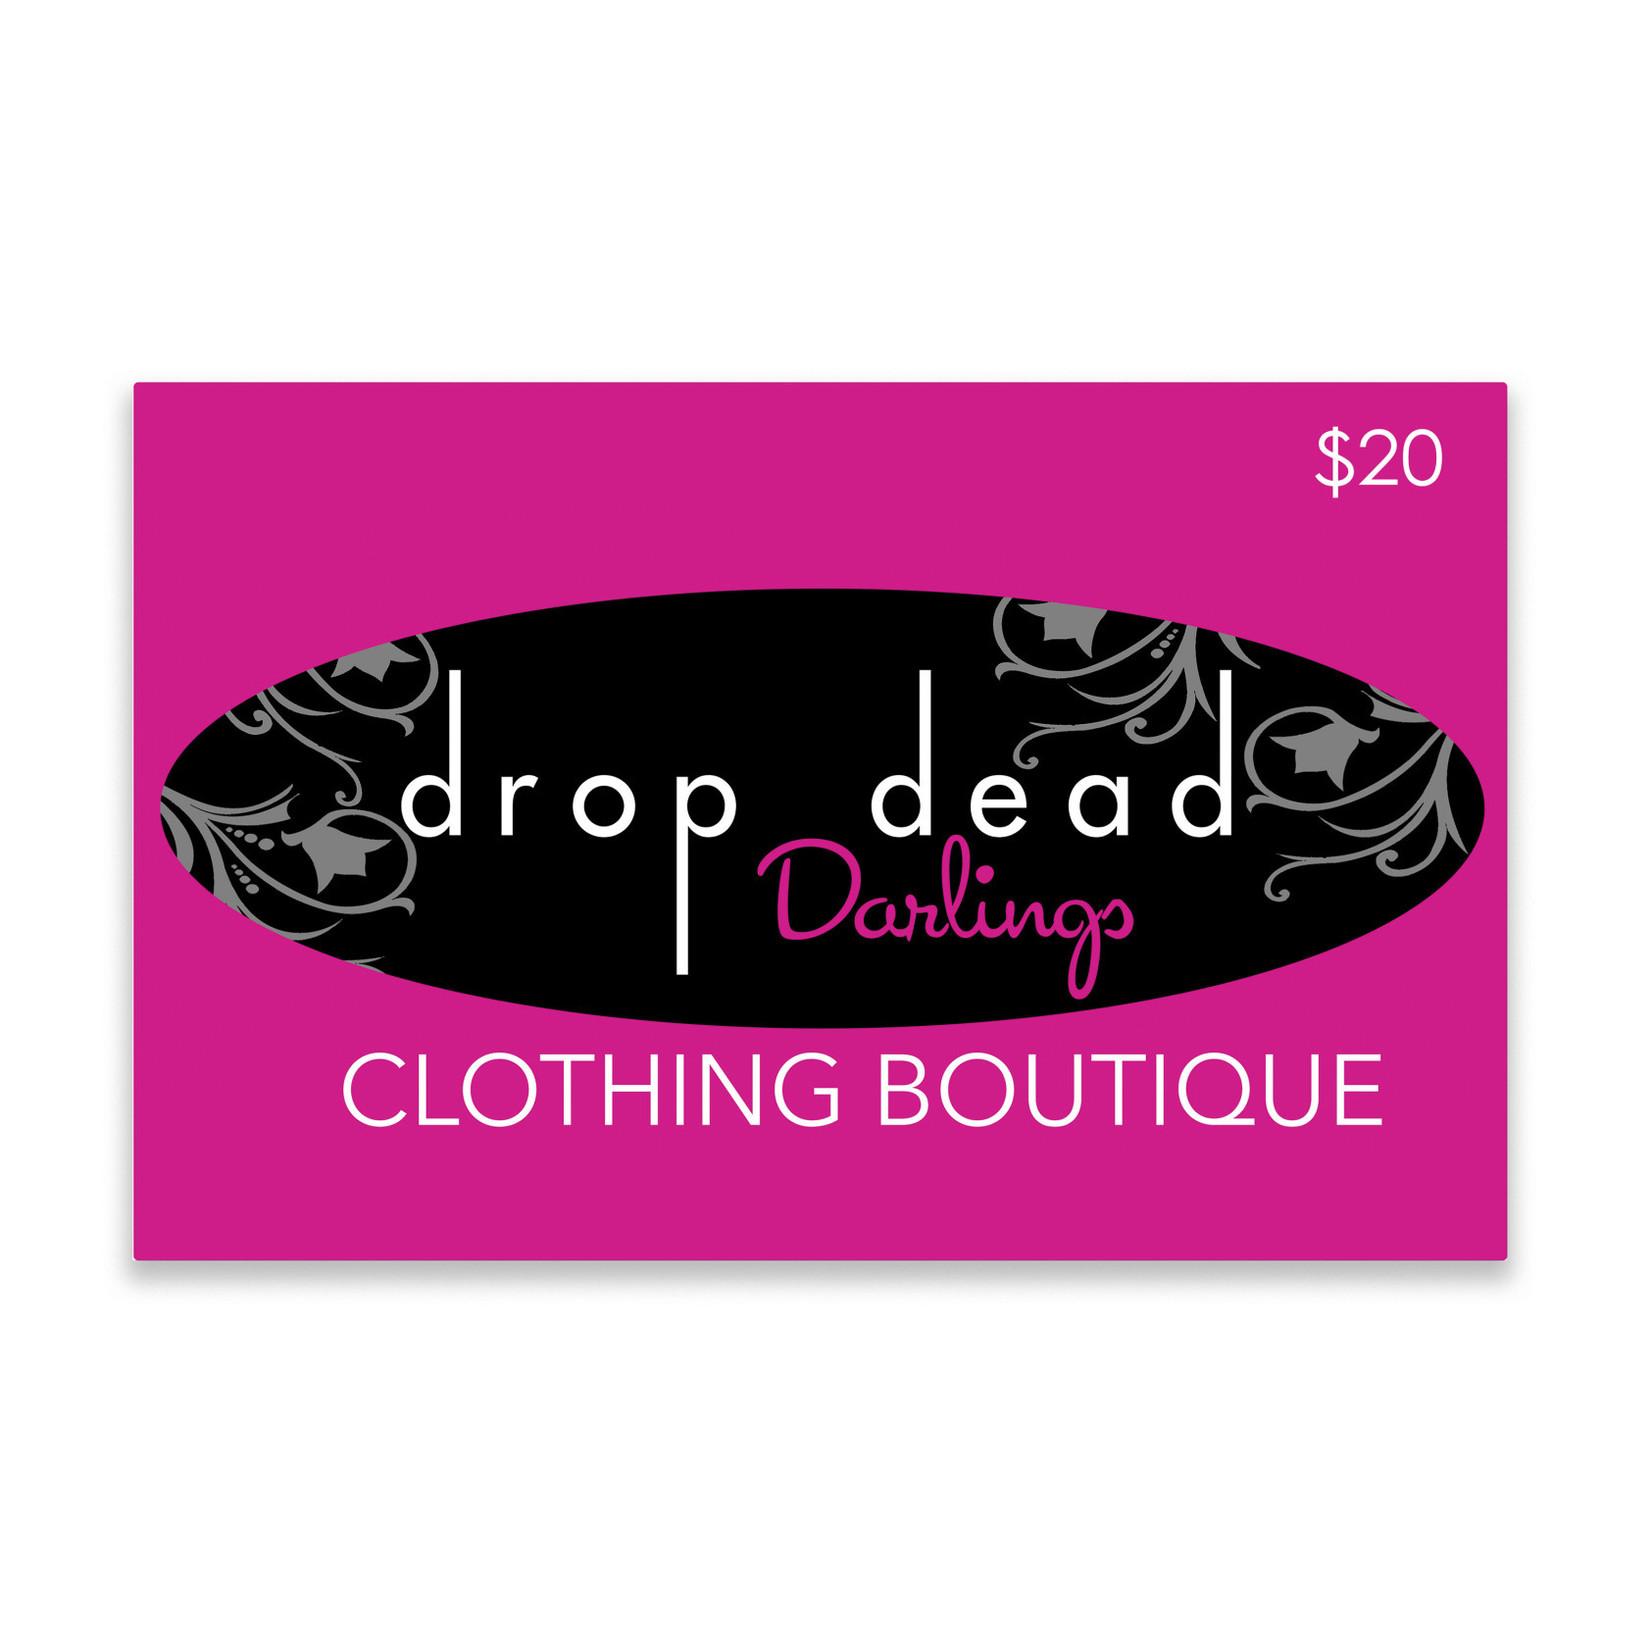 Drop Dead Darlings Gift Card - $20